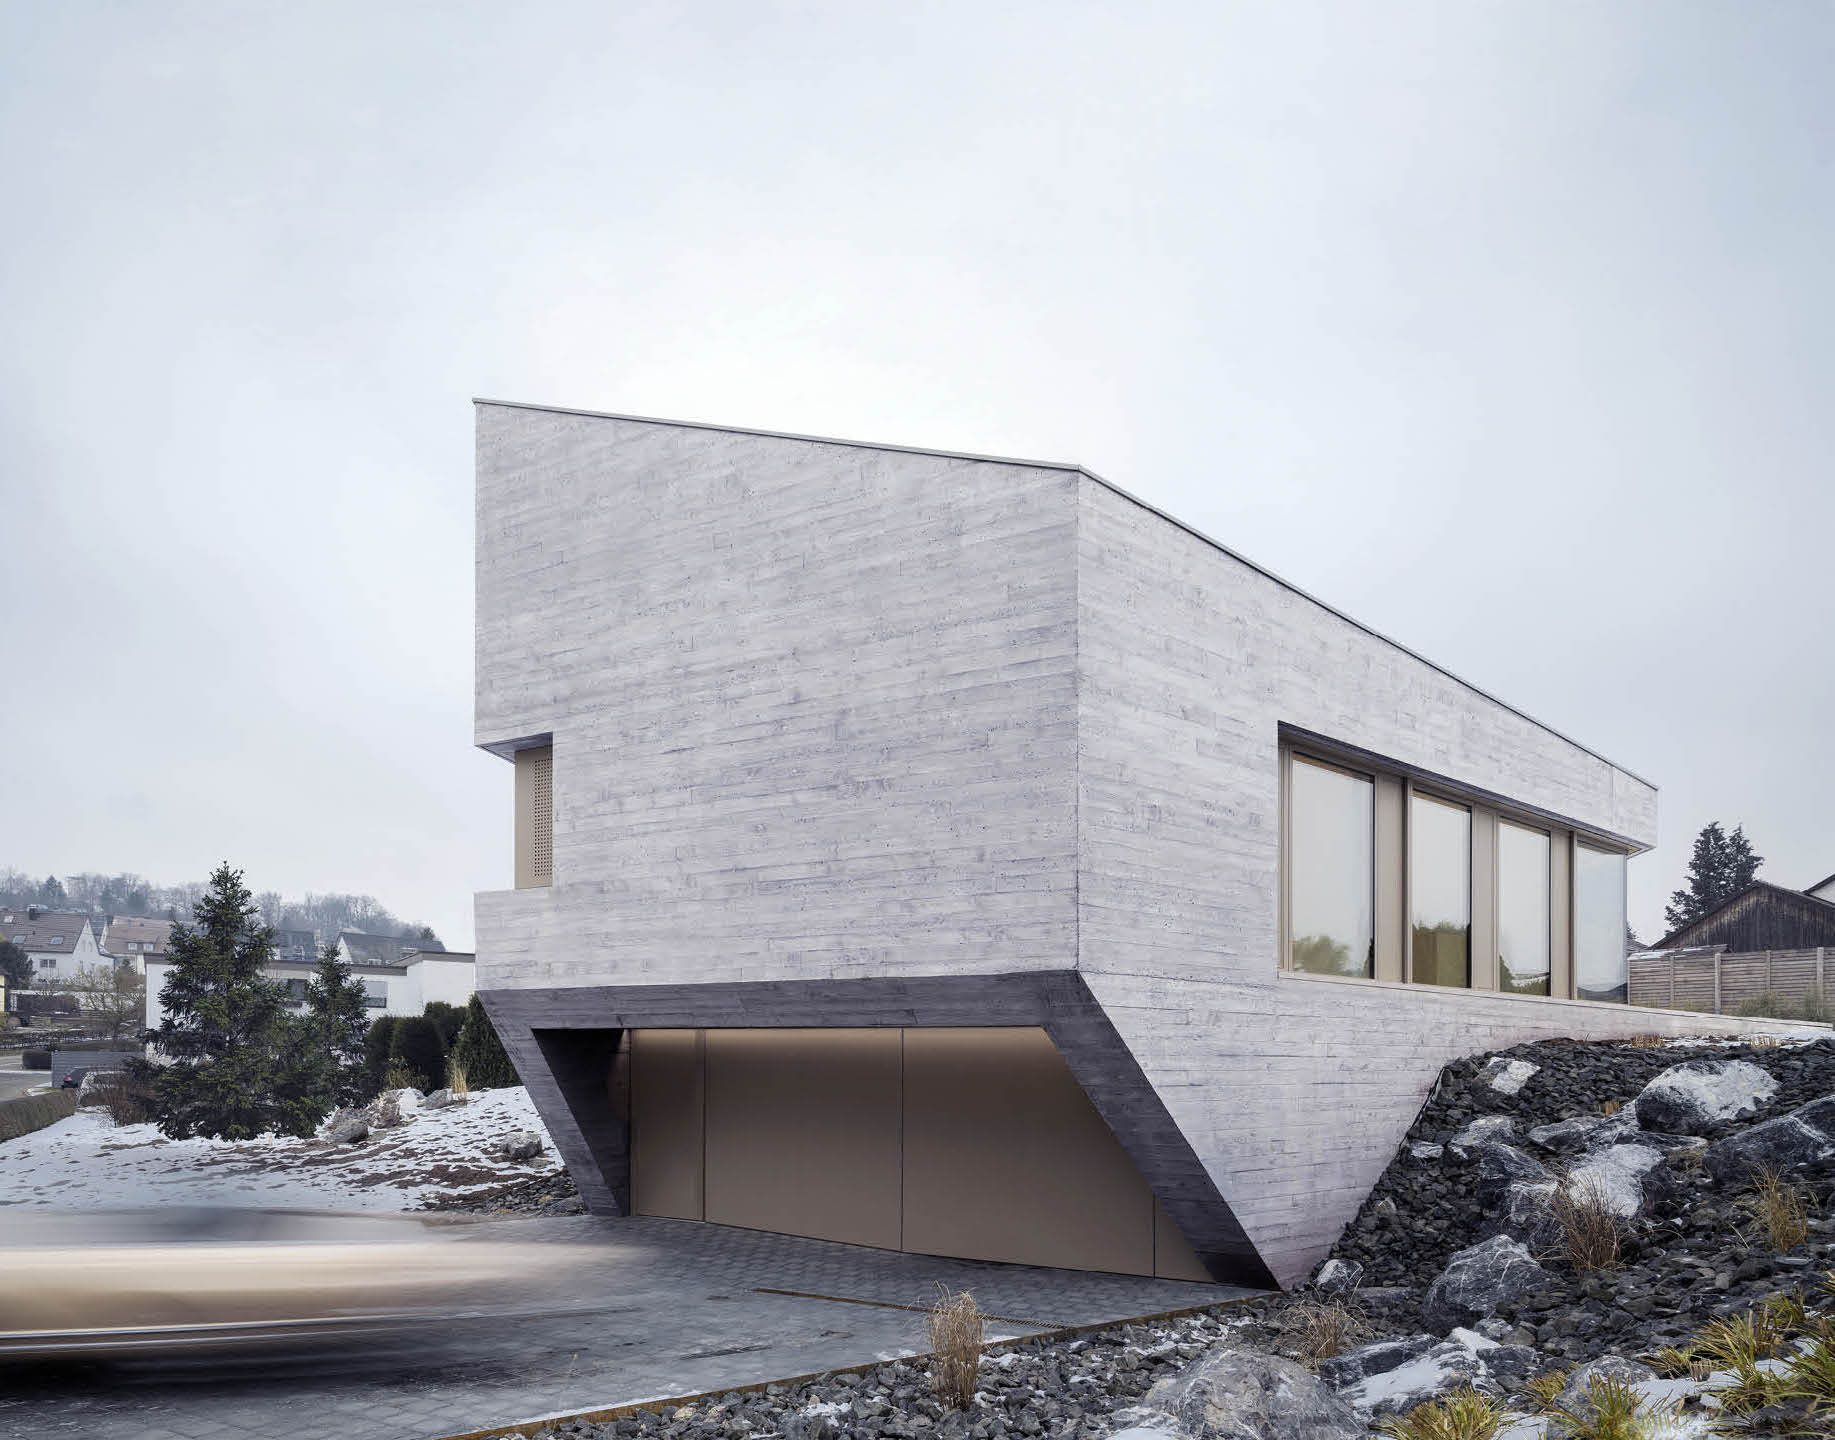 Modern Home Design Photo | Architecture, Modern architecture and ...